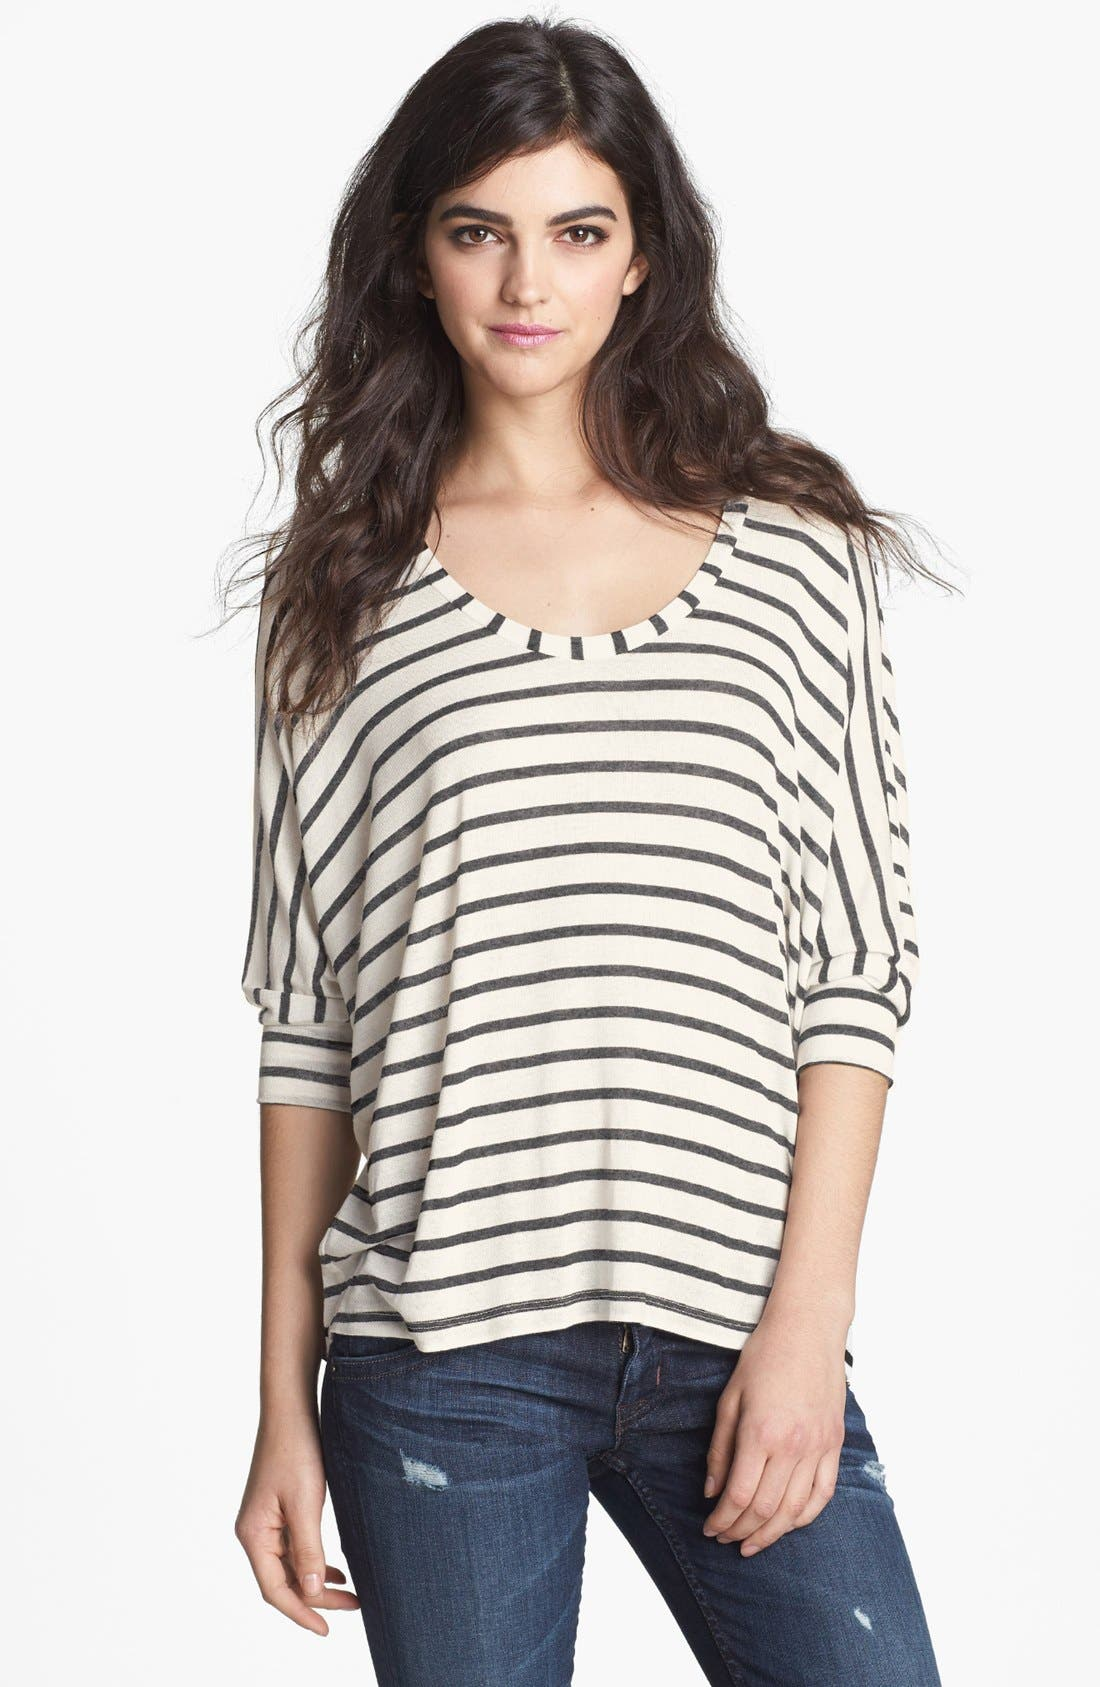 Main Image - Splendid Stripe Scoop Neck Top